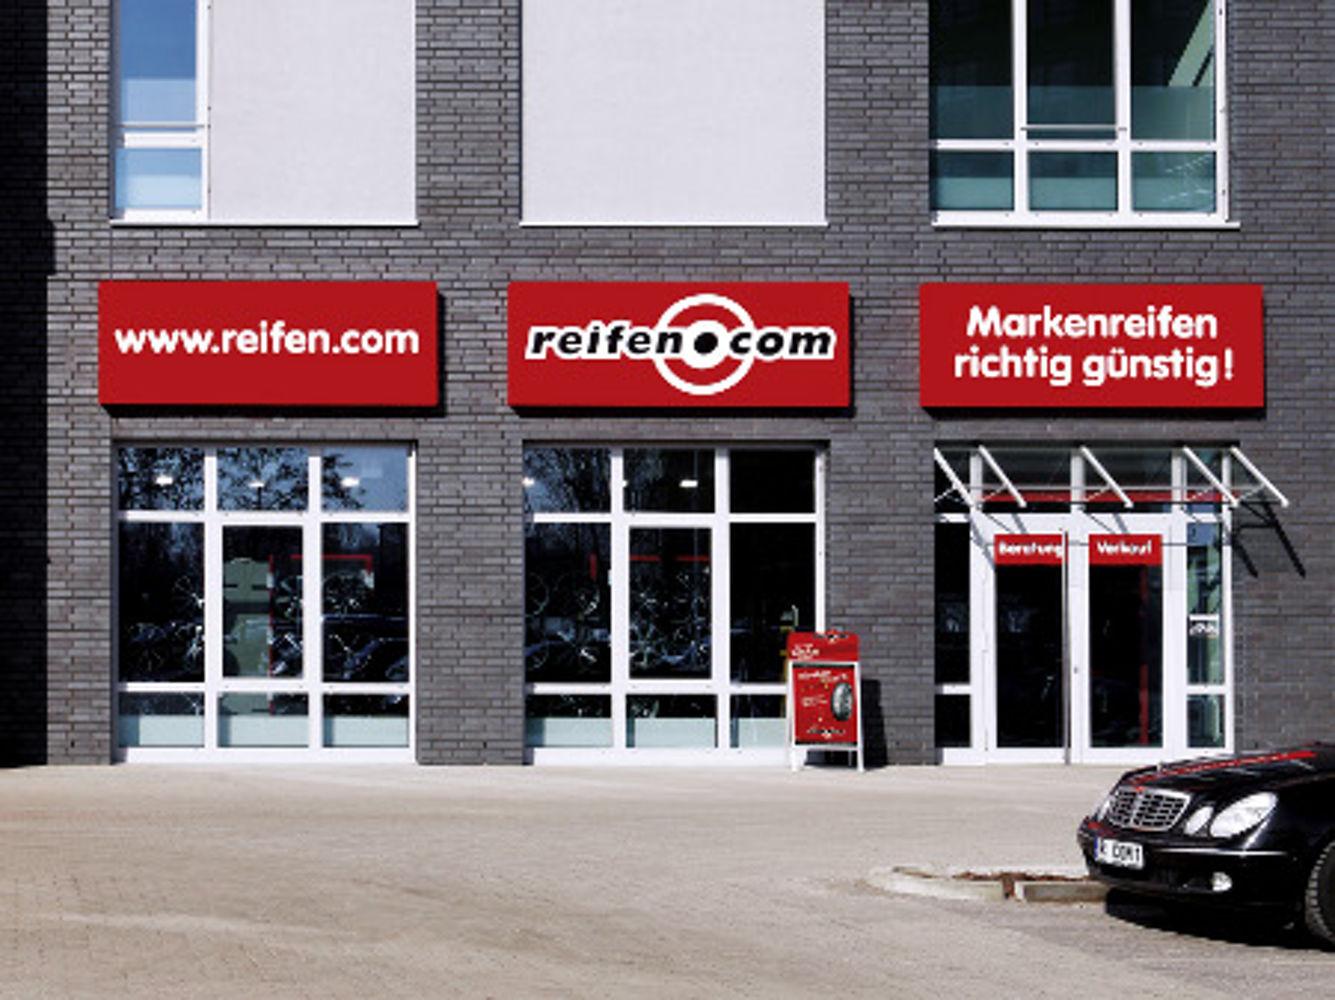 reifen.com-branch in Hanover Vahrenheide